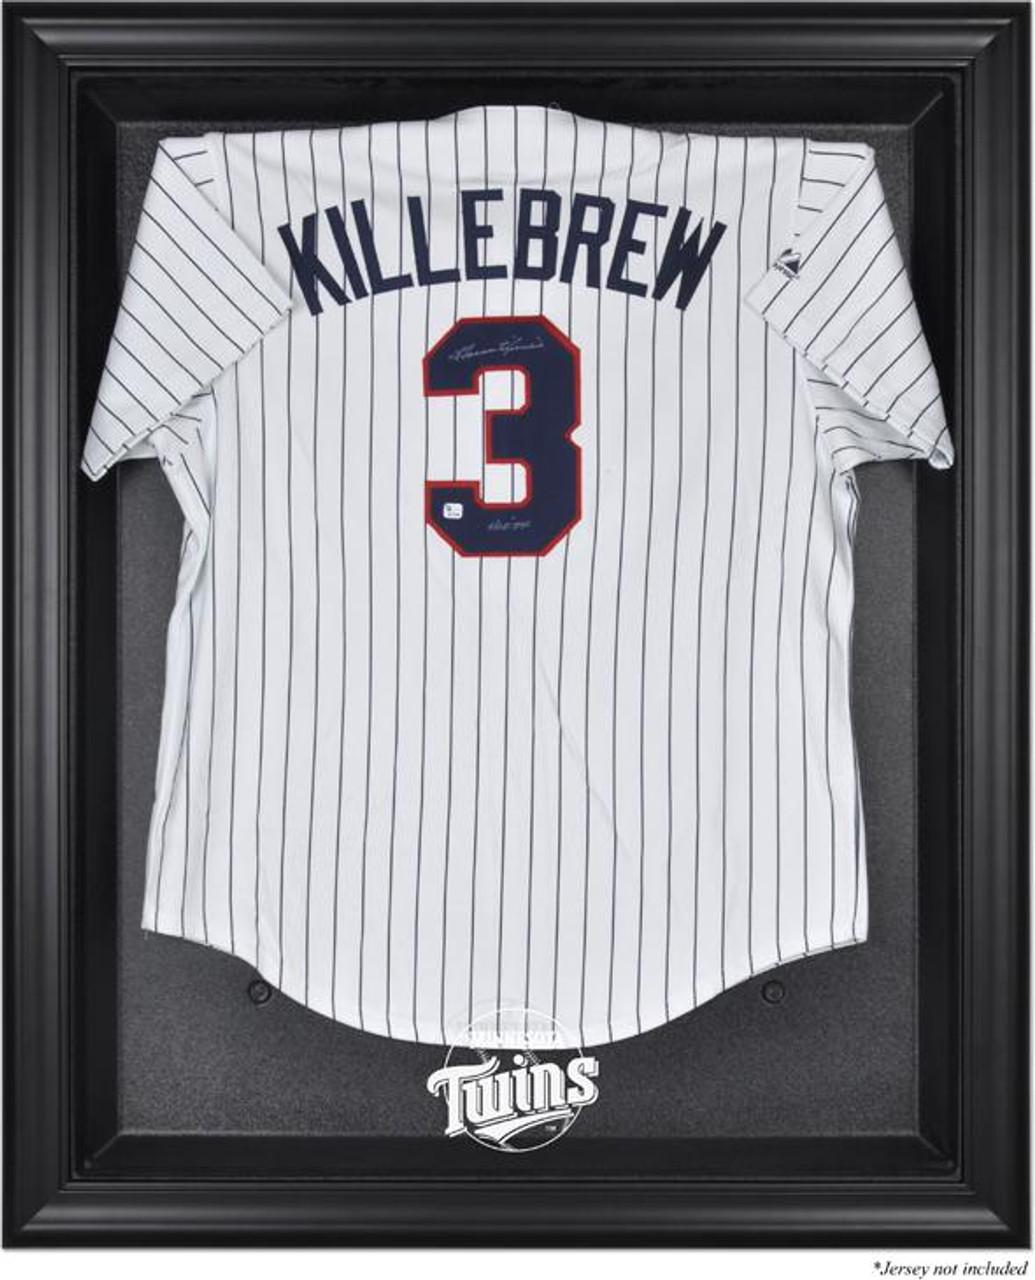 Black Framed MLB Twins Jersey Display Case | Nikco Sports Memorabilia